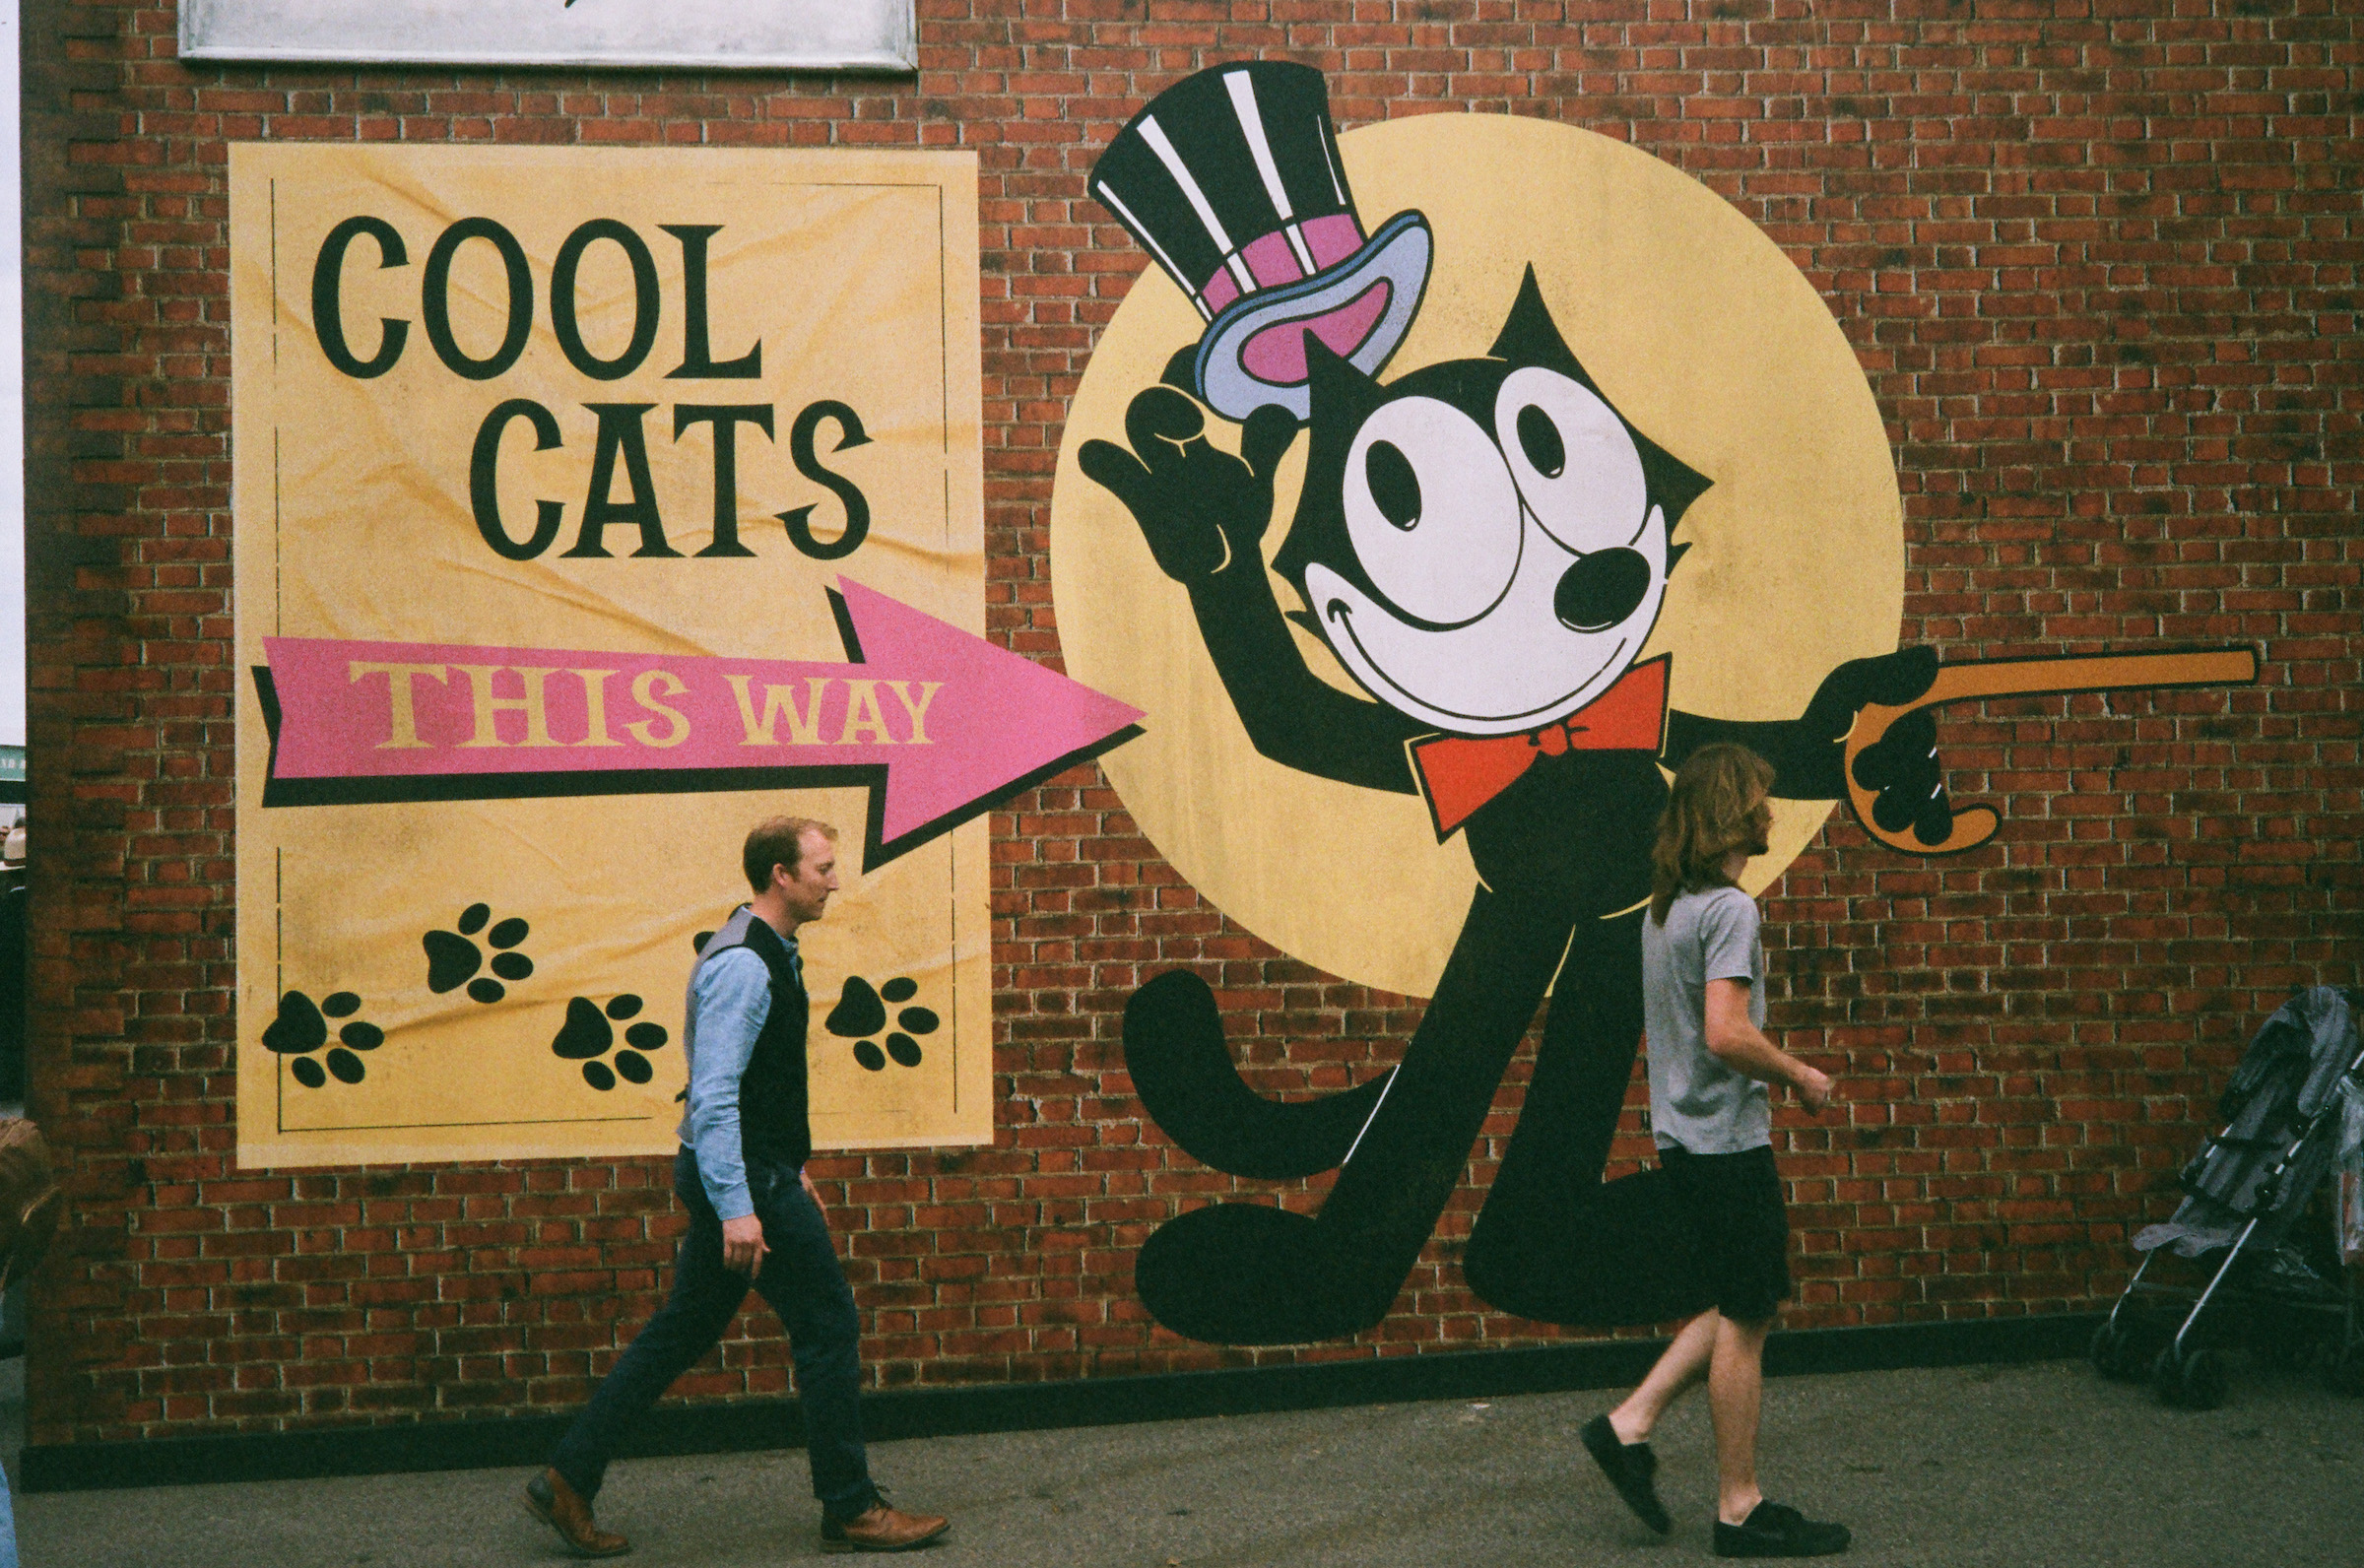 Goodwood Revival film cool cats event